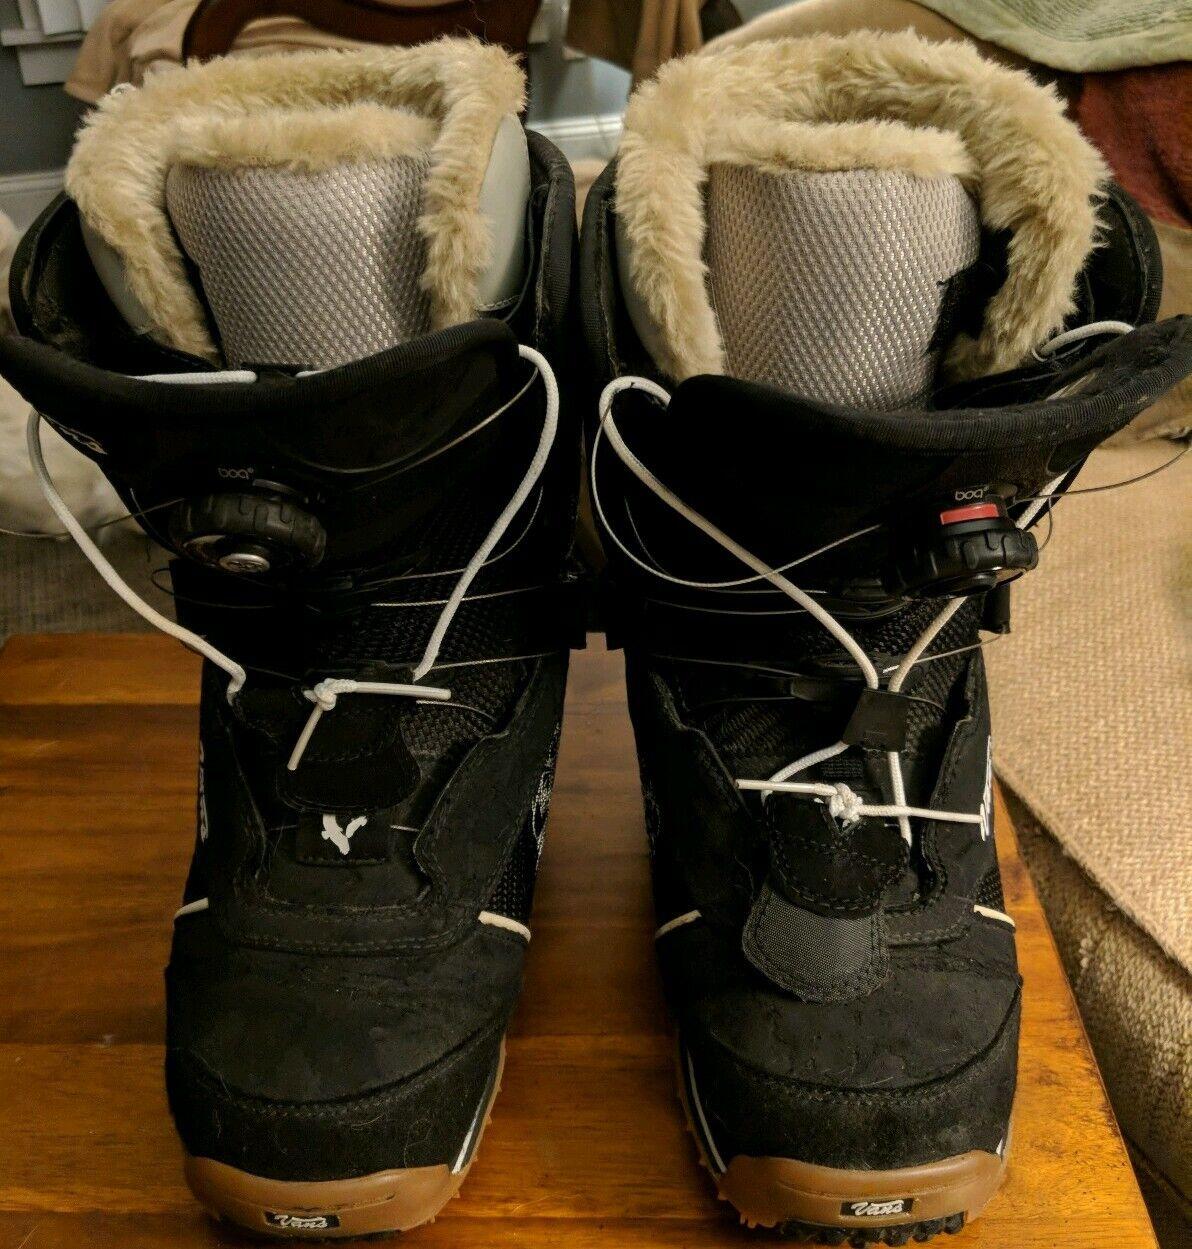 Furgoneta femenina Kira. botas de esquí de 7 yardas.